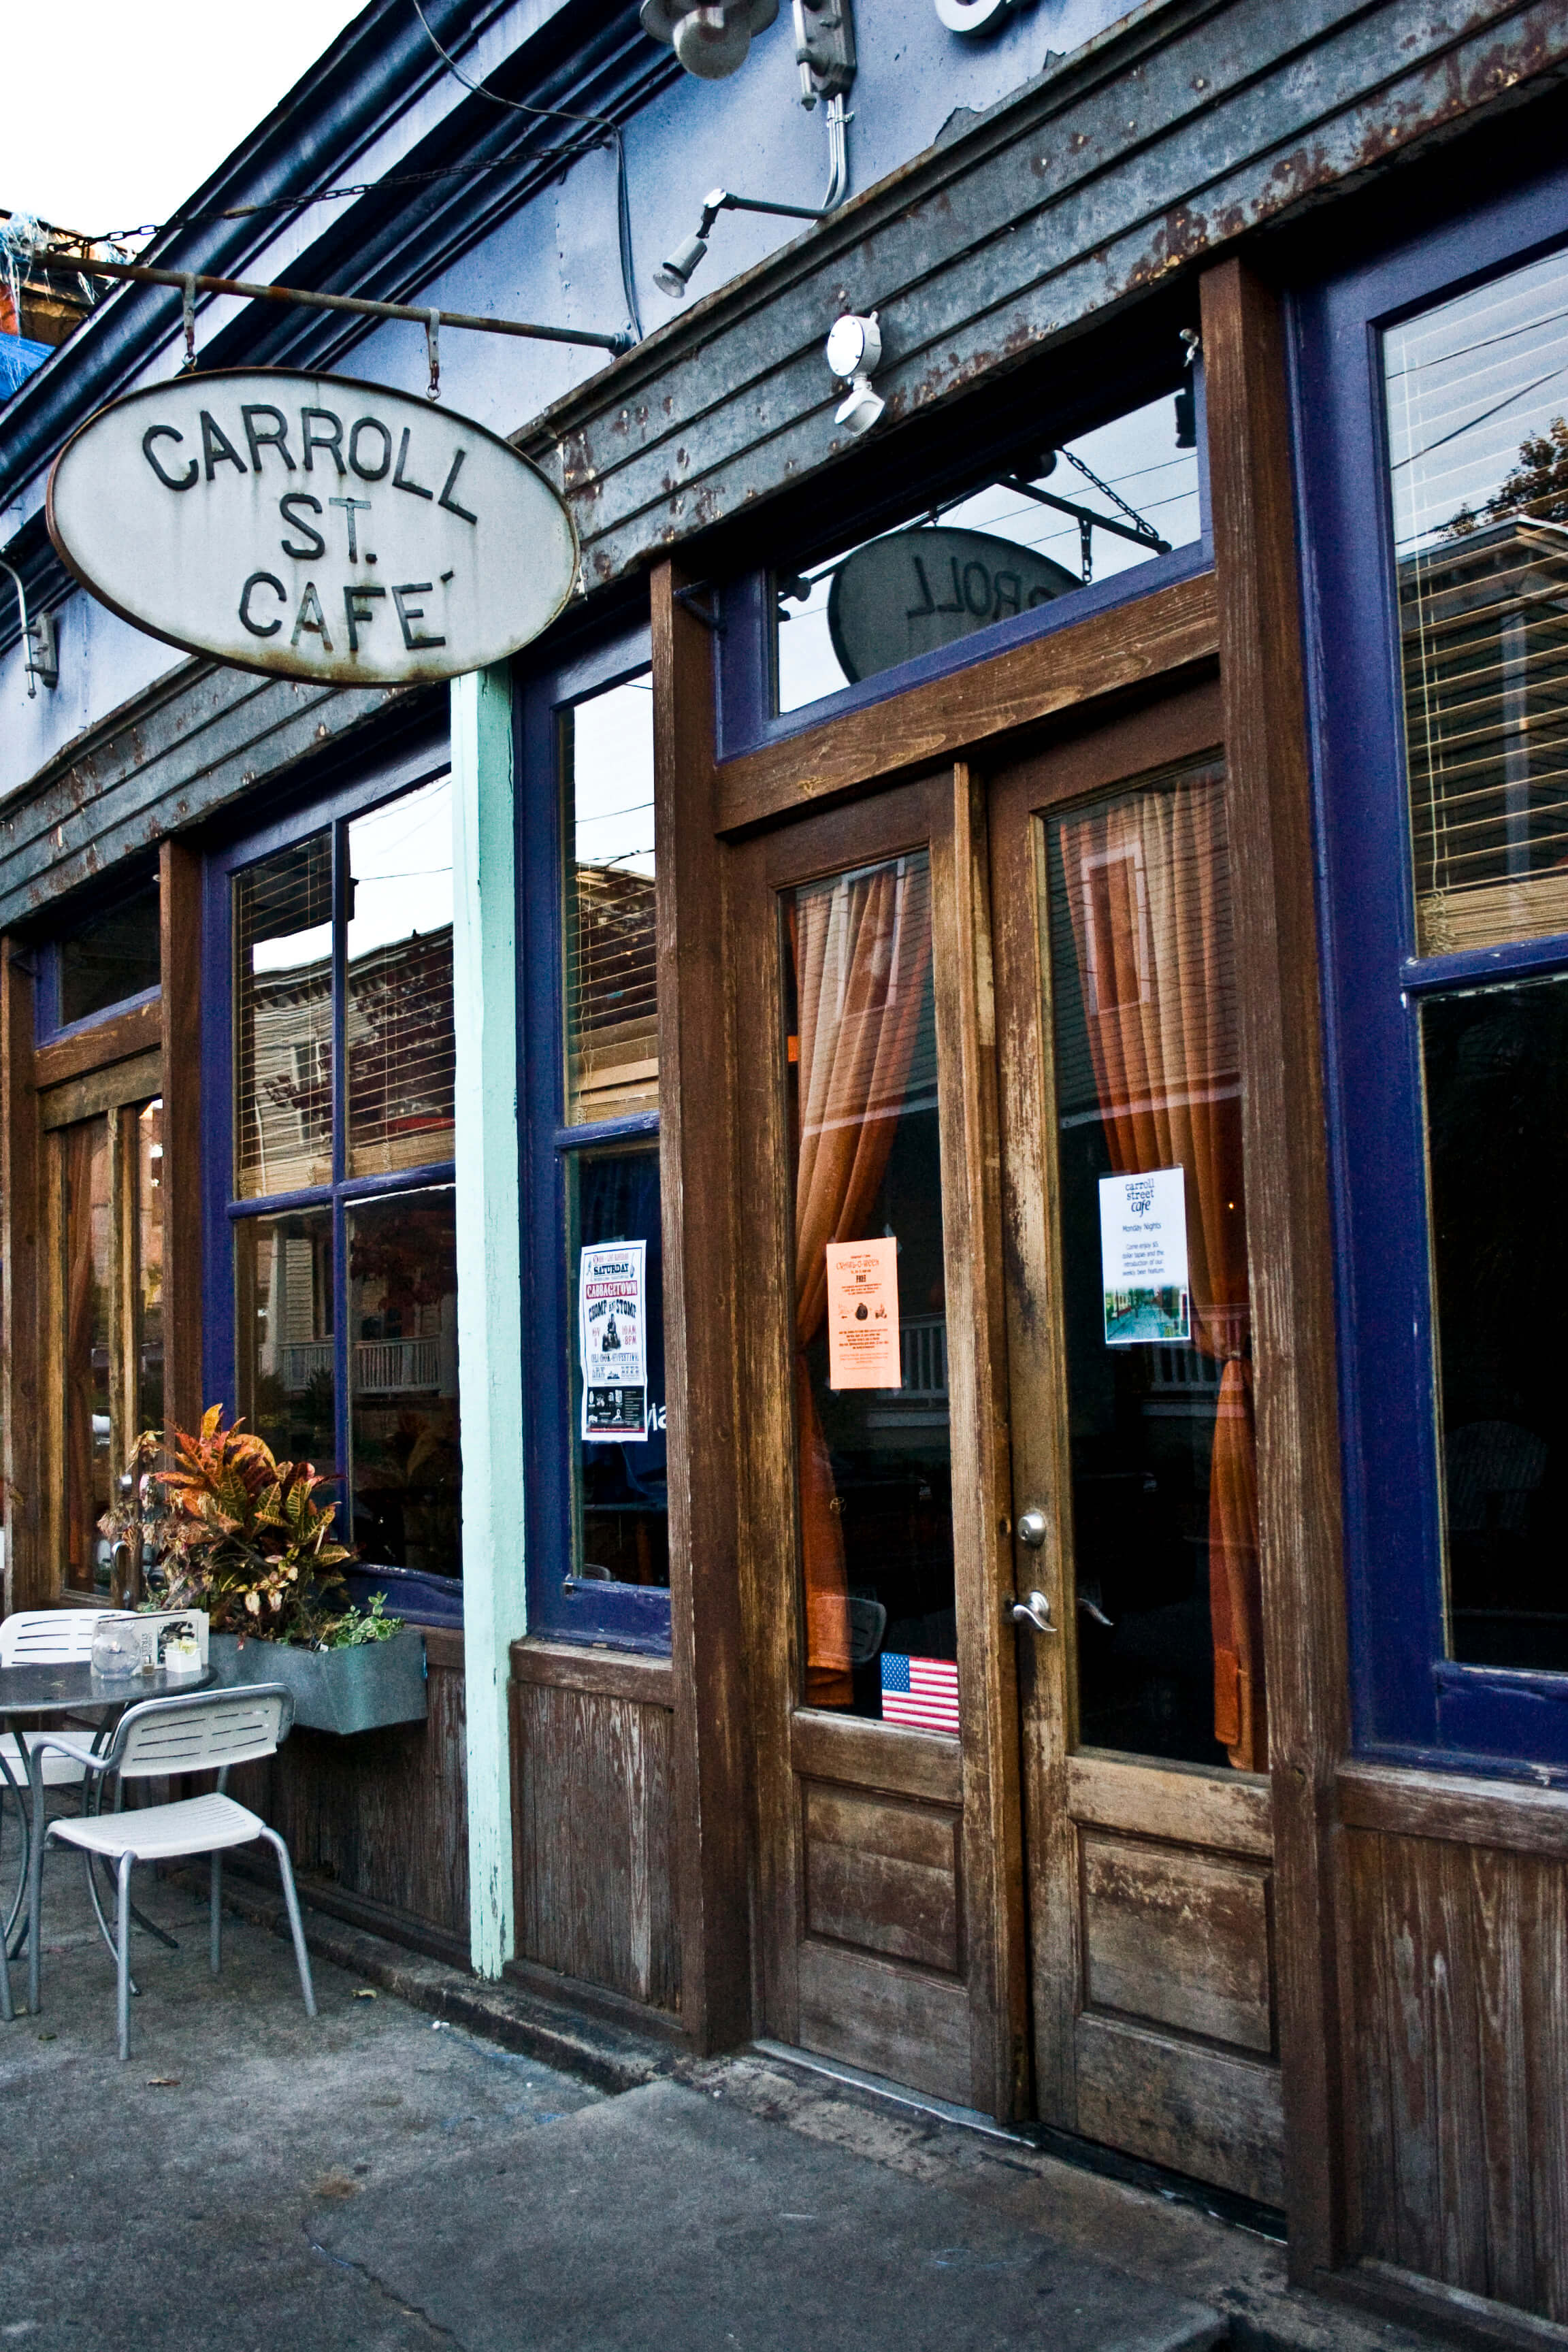 Carroll street cafe cabbage town atlanta